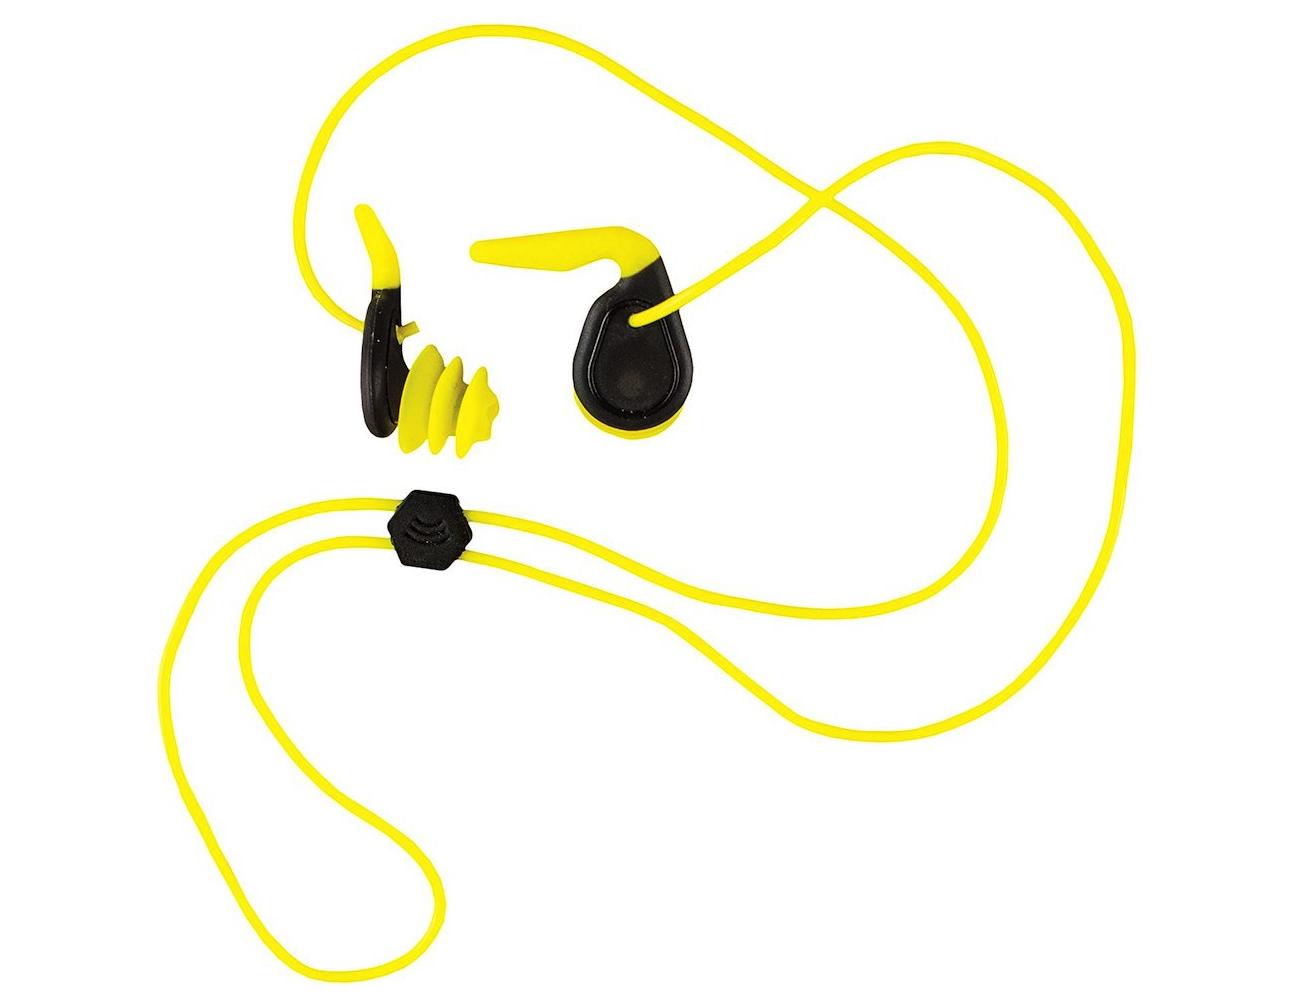 FINIS SwimEars Innovative Ear Plugs